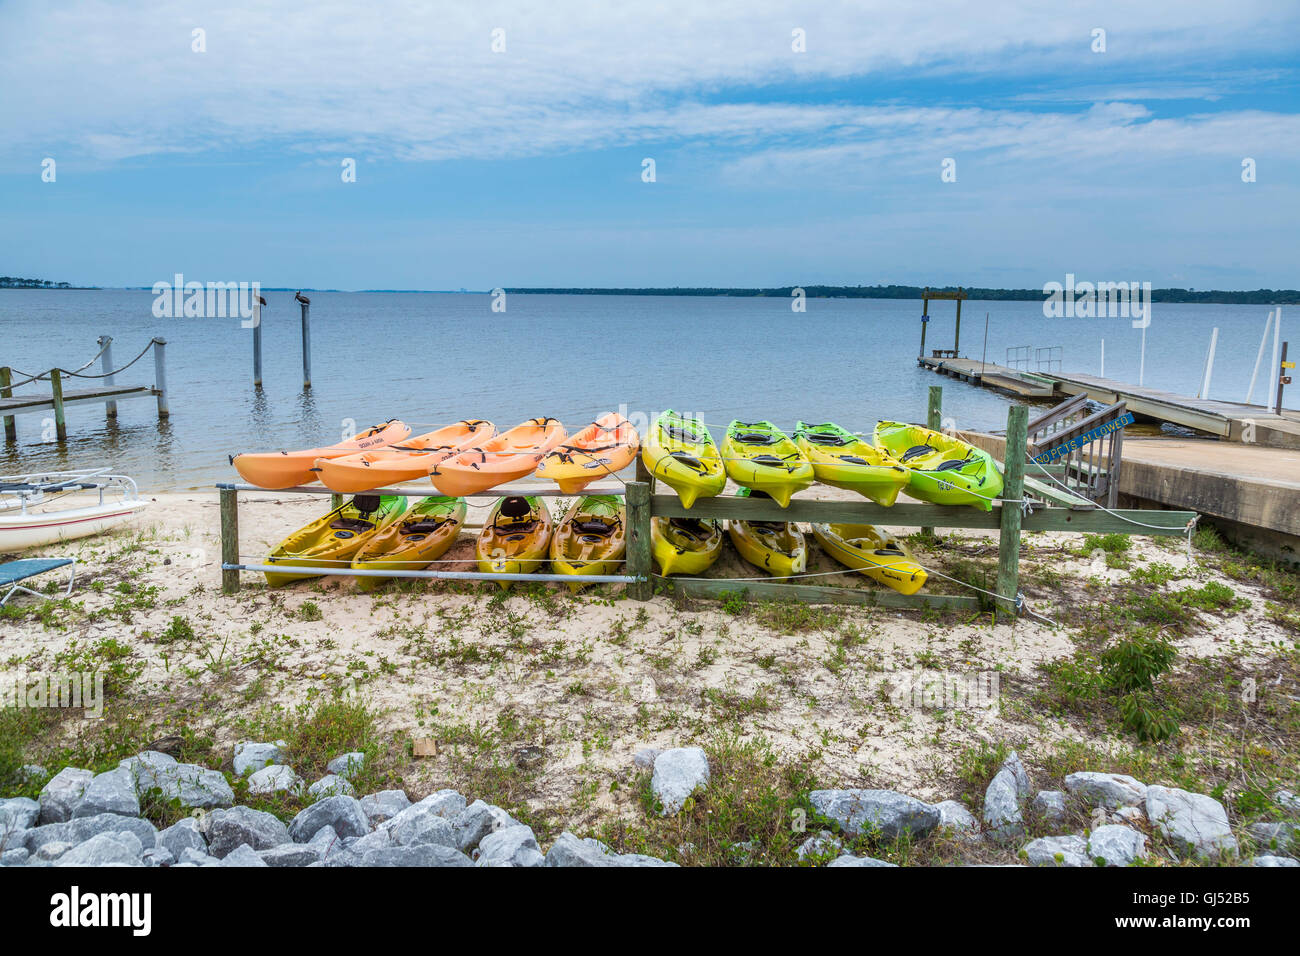 Colorful rental kayaks on rack along Perdido Bay near Perdido, Florida Stock Photo